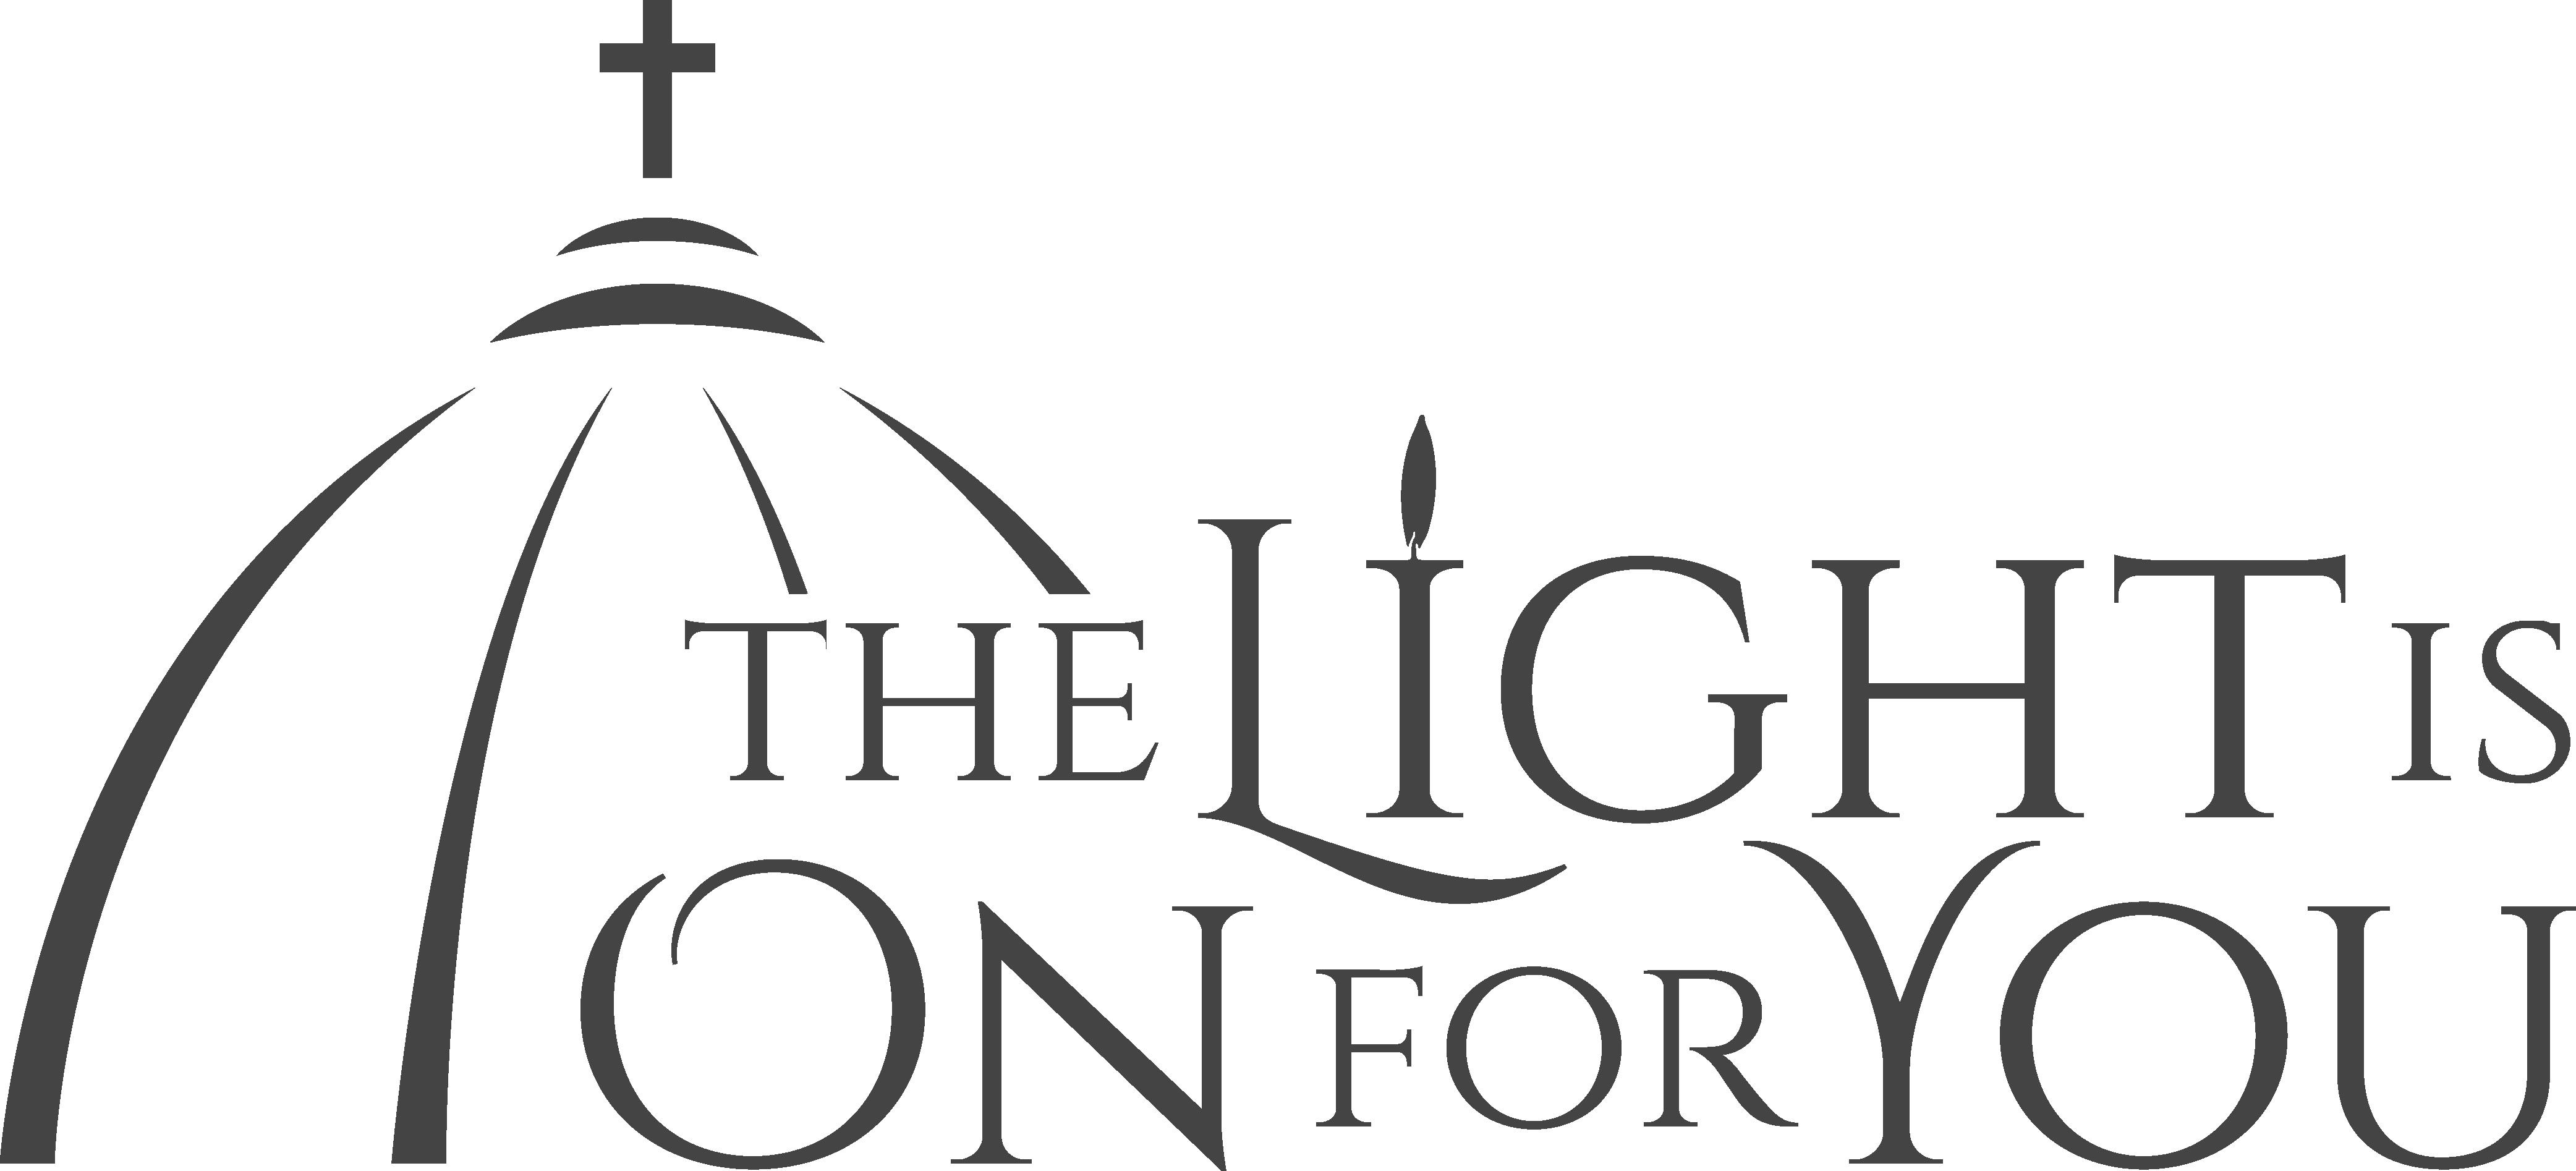 The light is on. Pastor clipart catholic community